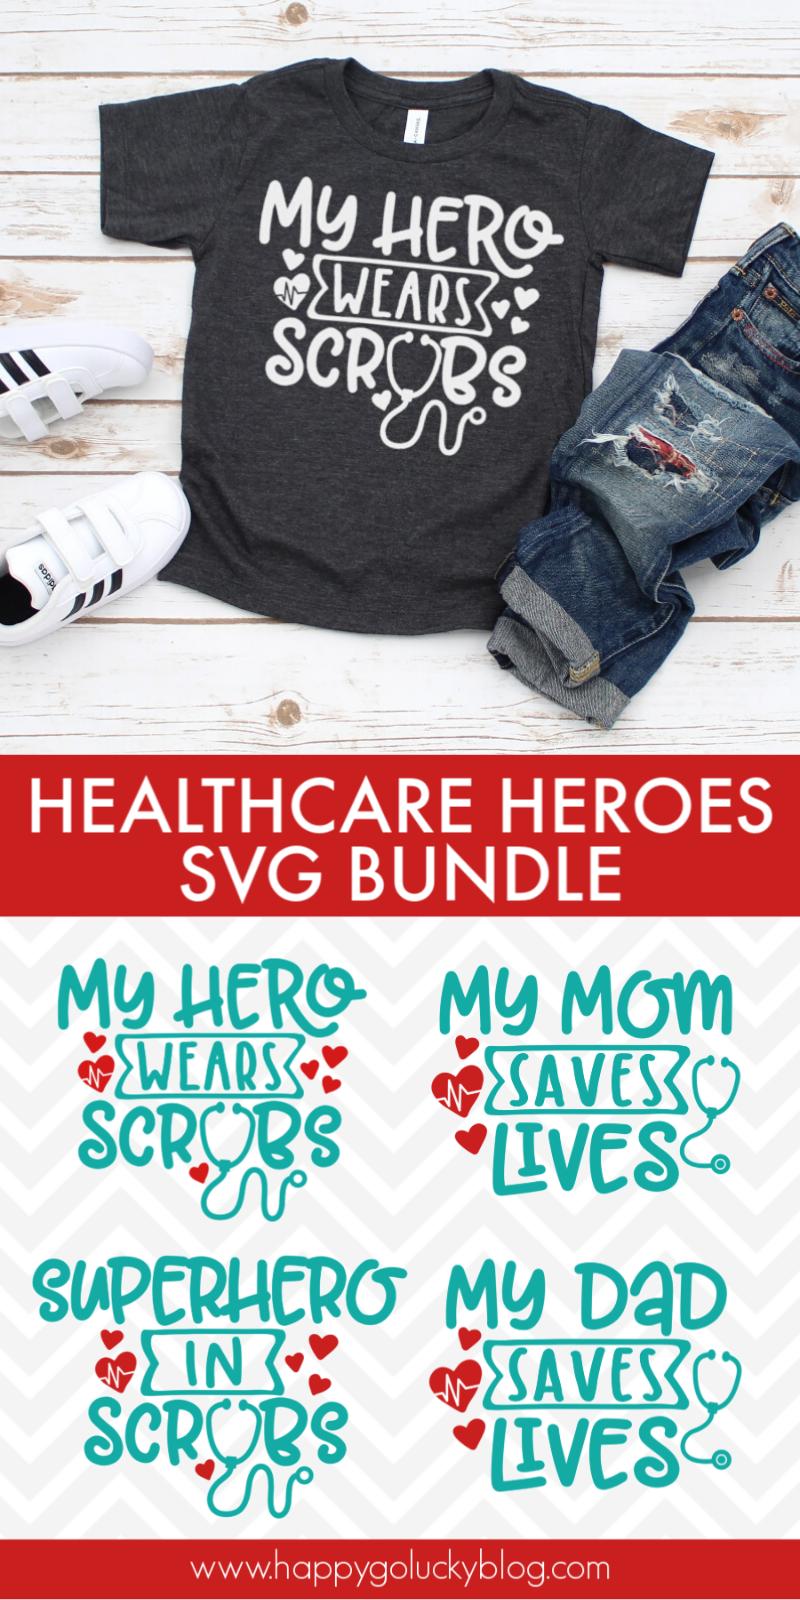 Healthcare Heroes SVG Bundle